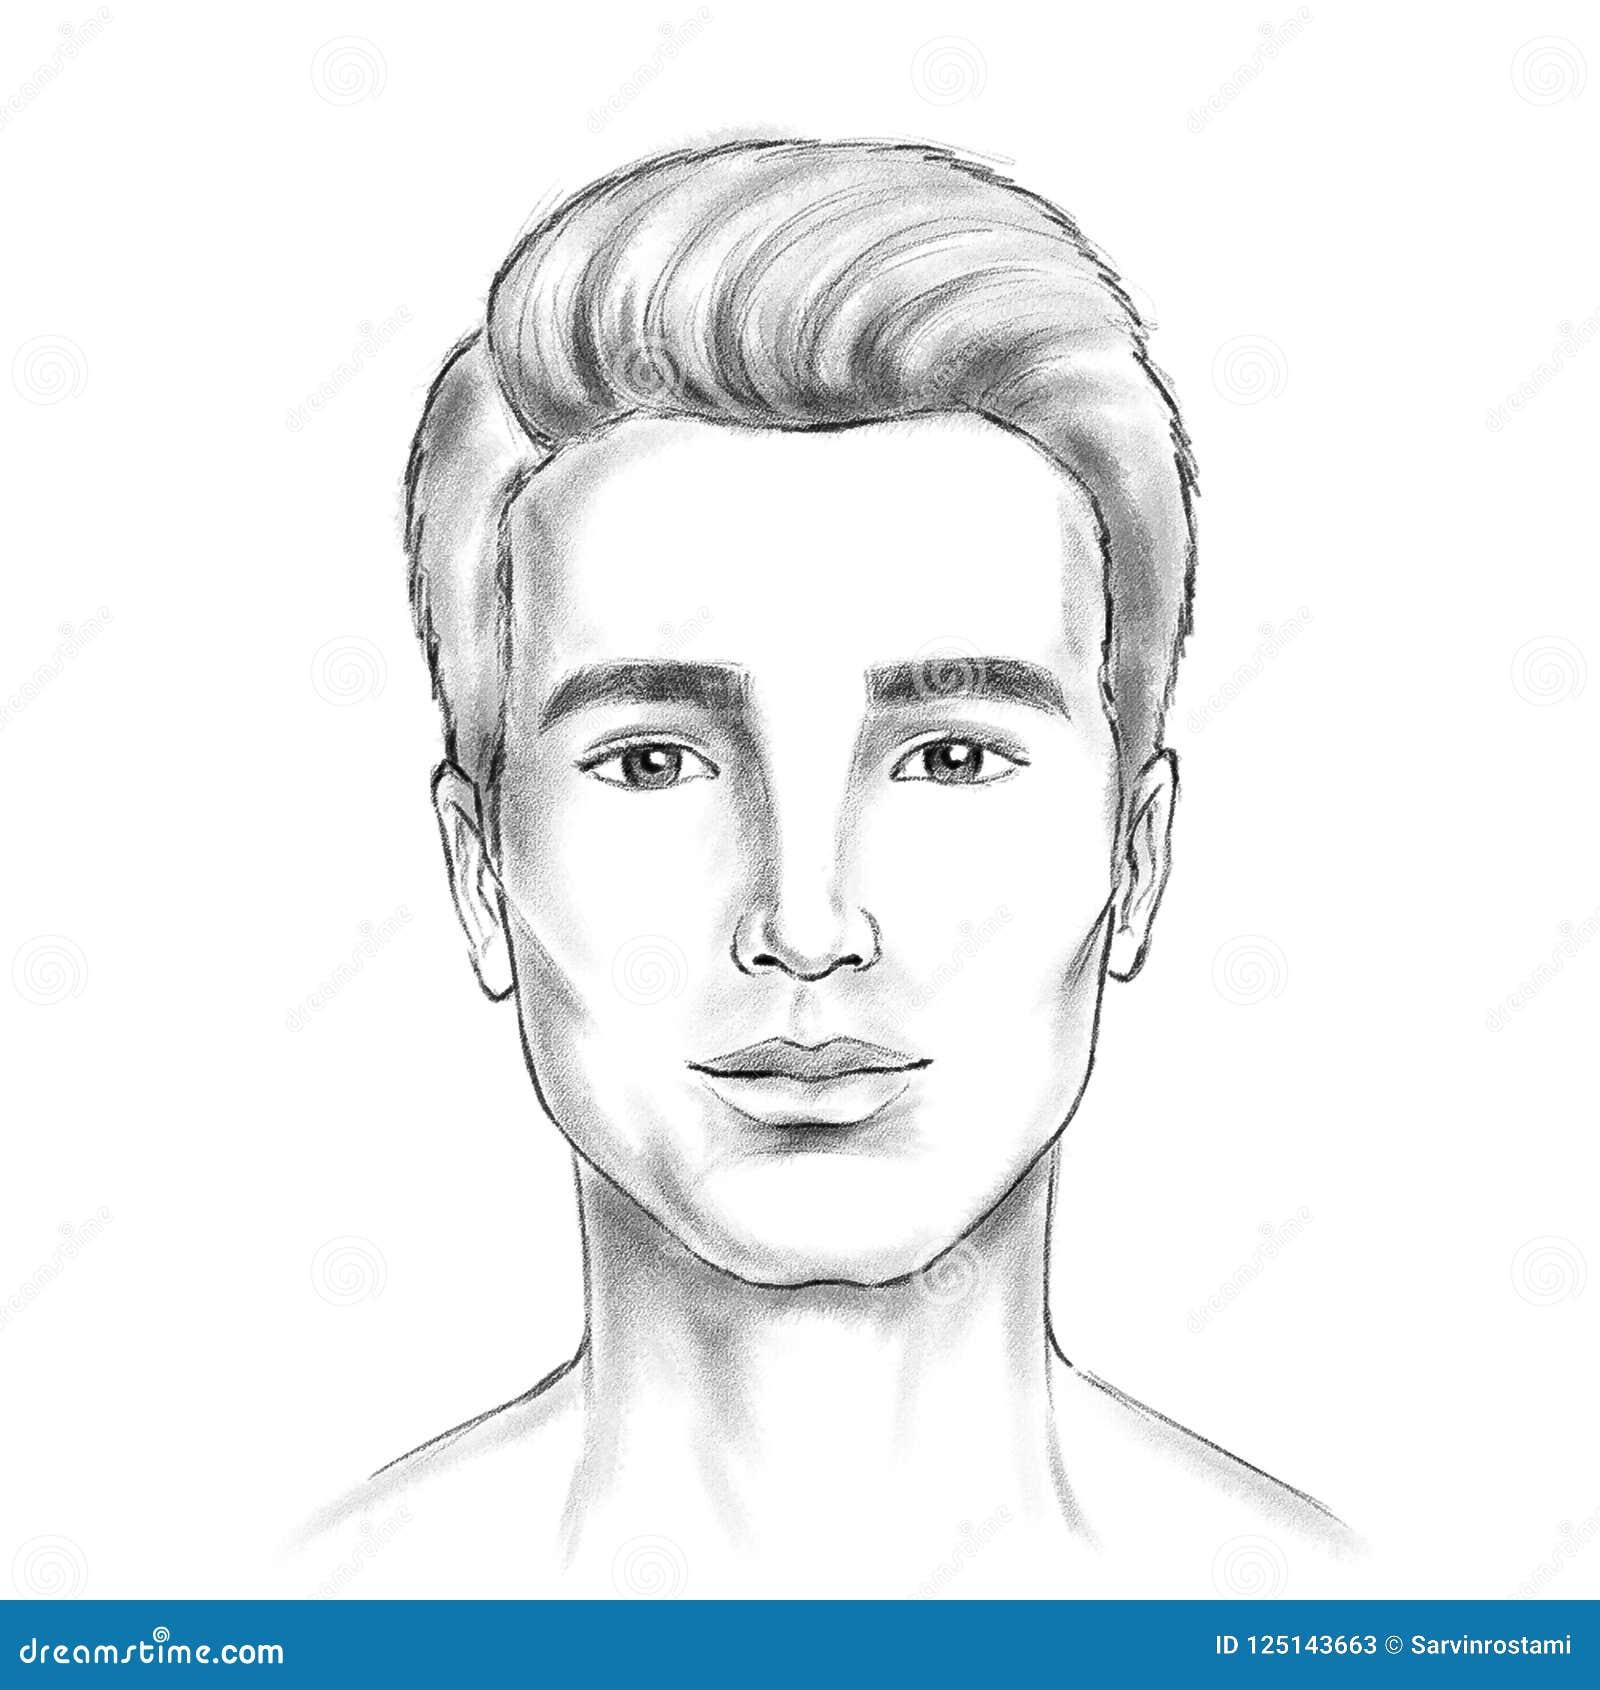 Man face sketch artwork digital painting look likes pencil